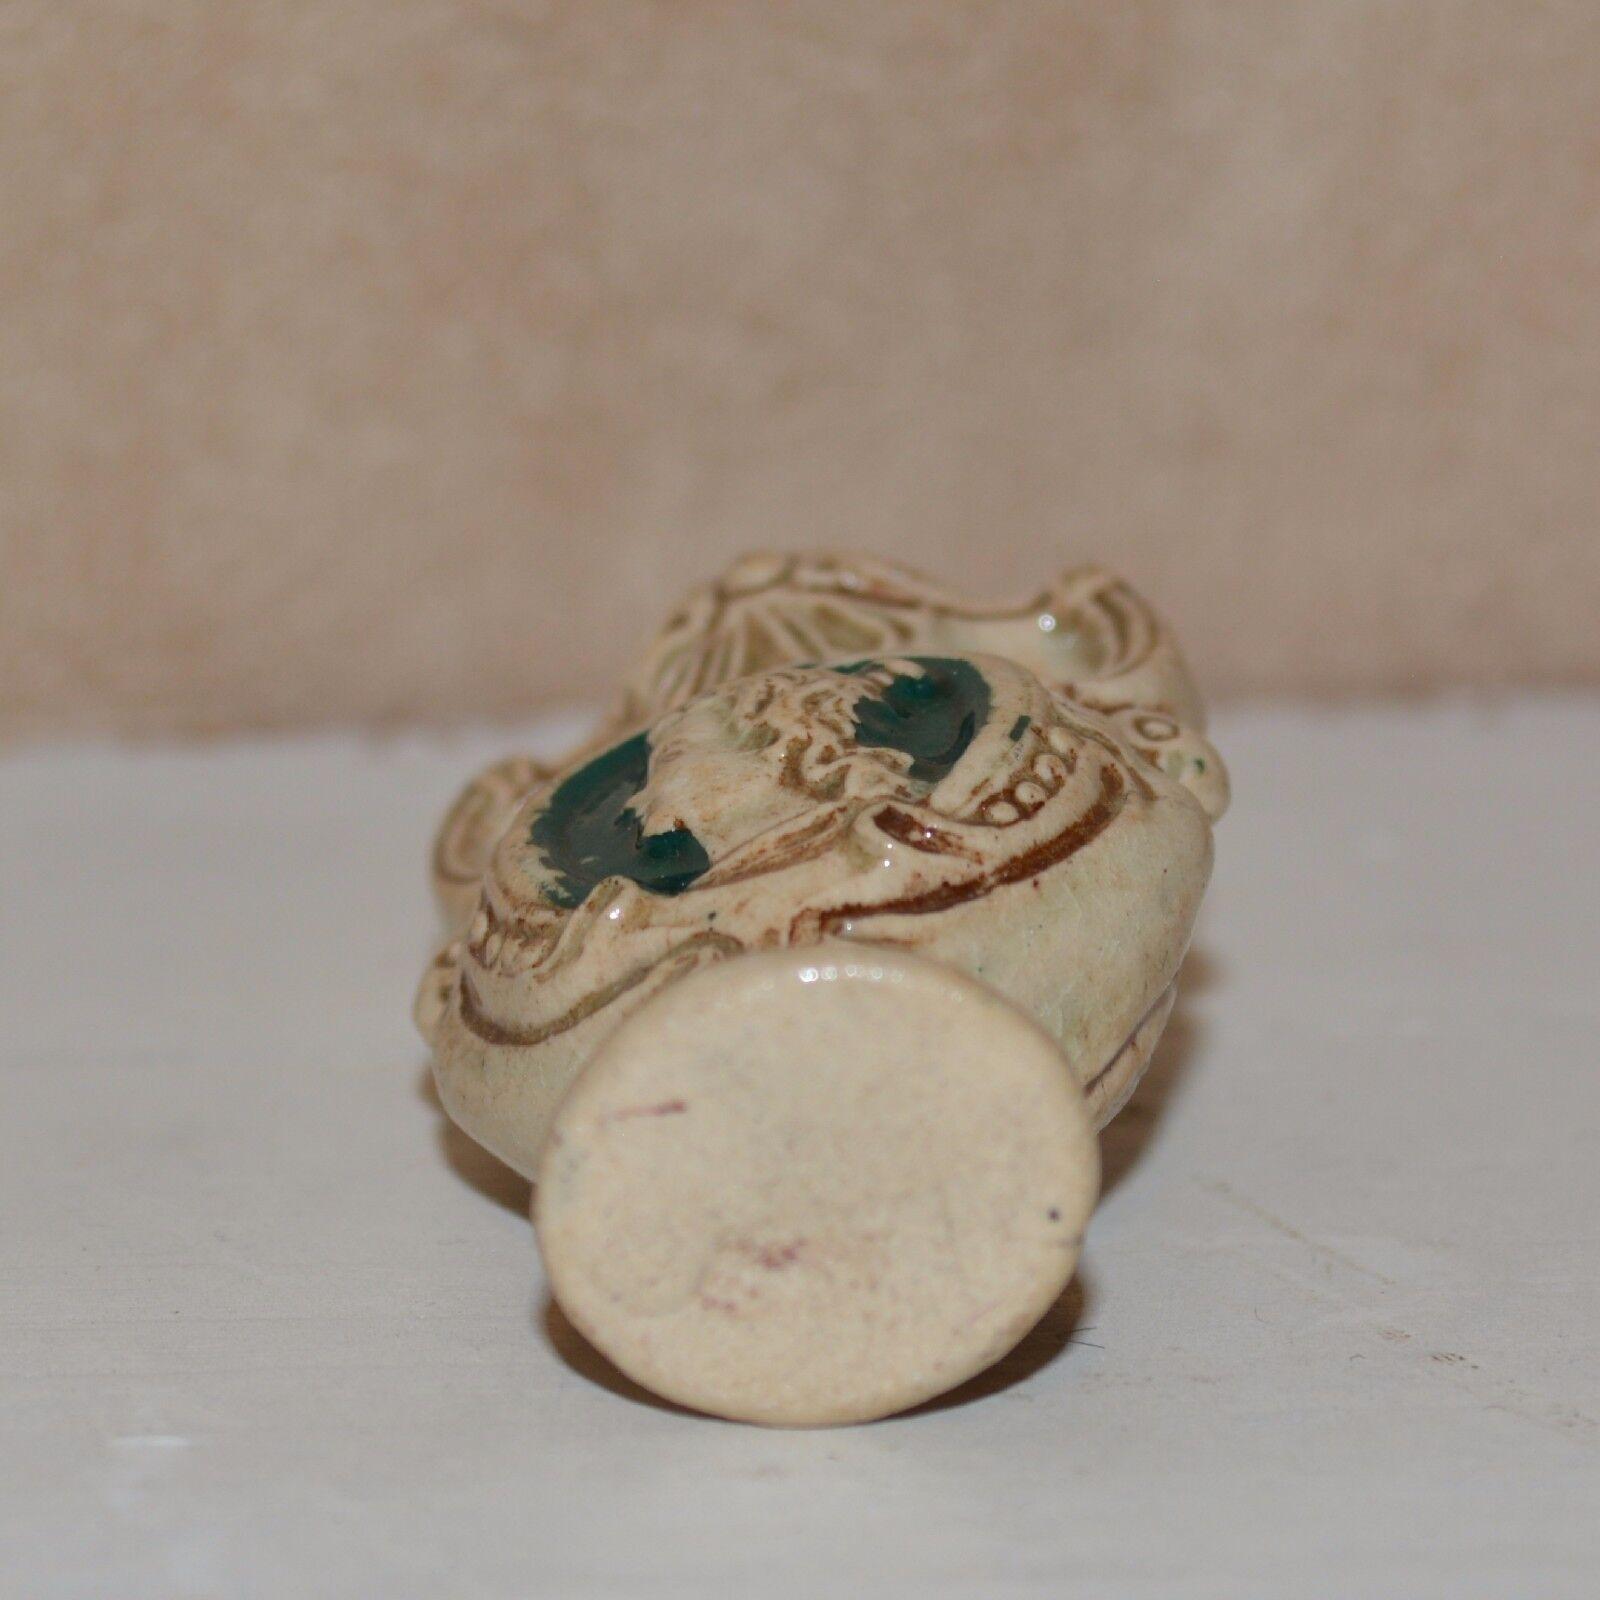 Dollhouse miniature 1:12 vase stoneware 1:12 miniature eb0ec3